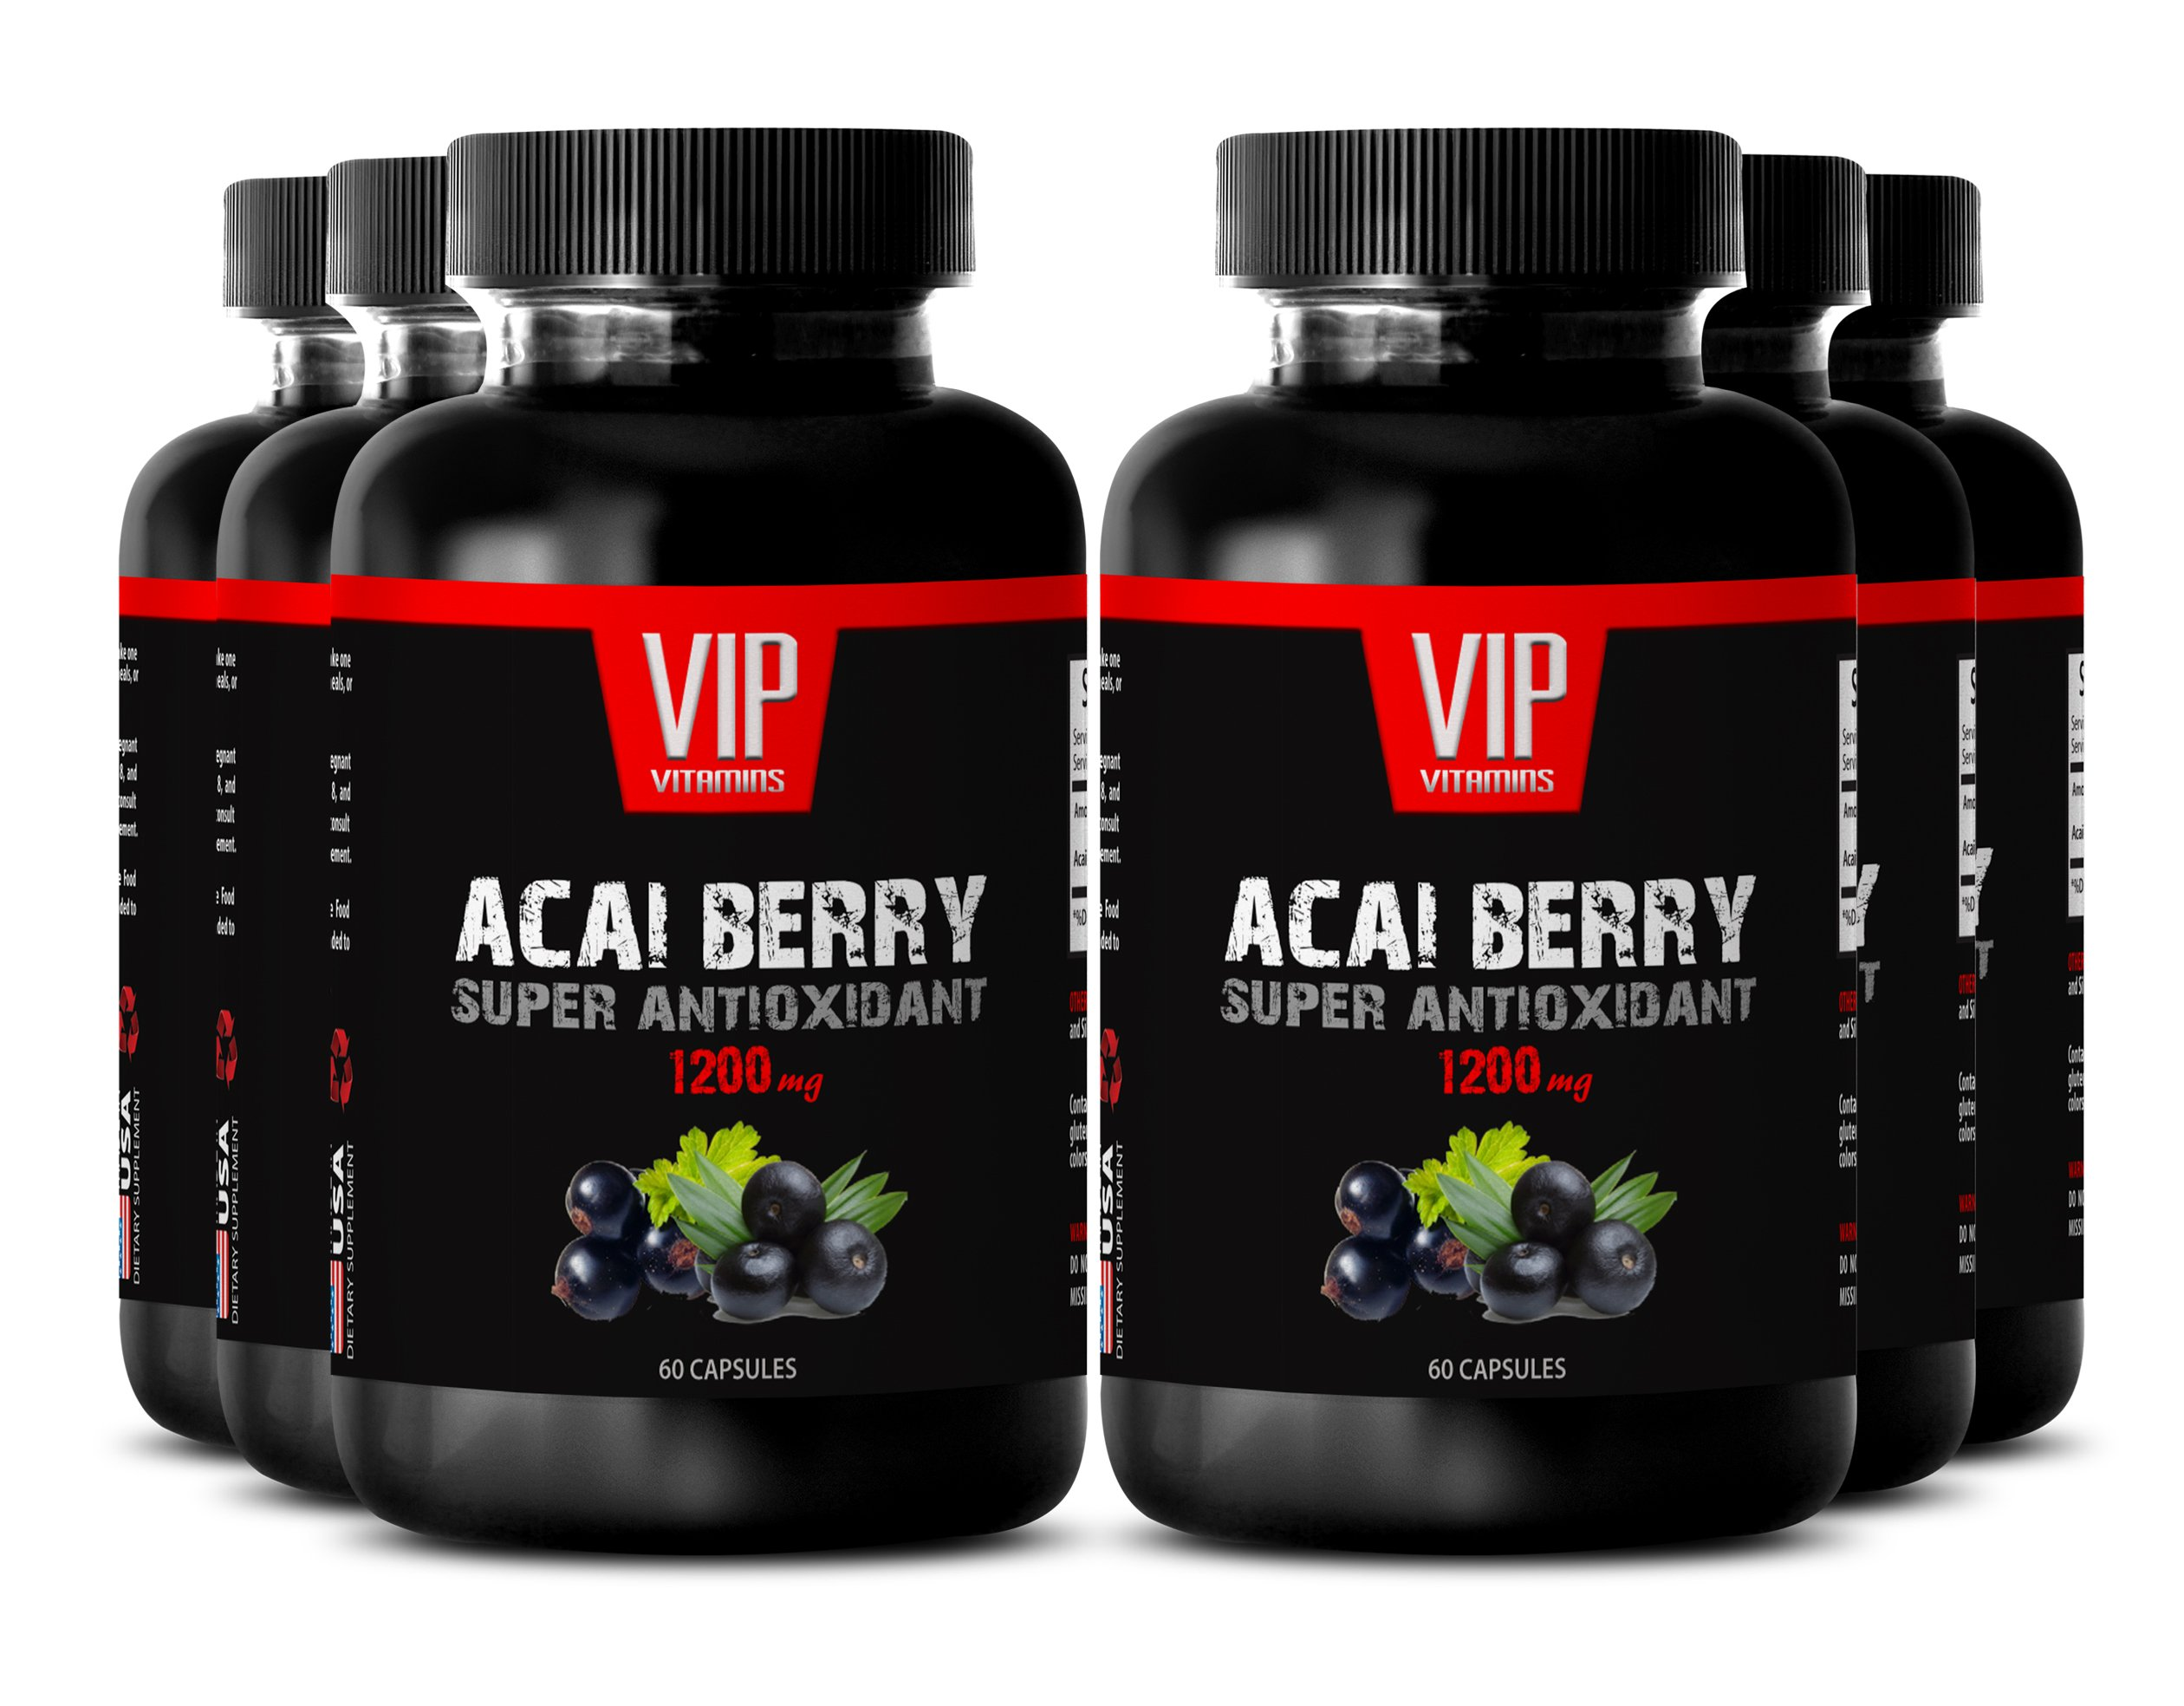 VIP VITAMINS Acai berry fitness - ACAI BERRY SUPER ANTIOXIDANT EXTRACT 1200 MG - Energy pills natural - 6 Bottles 360 Capsules